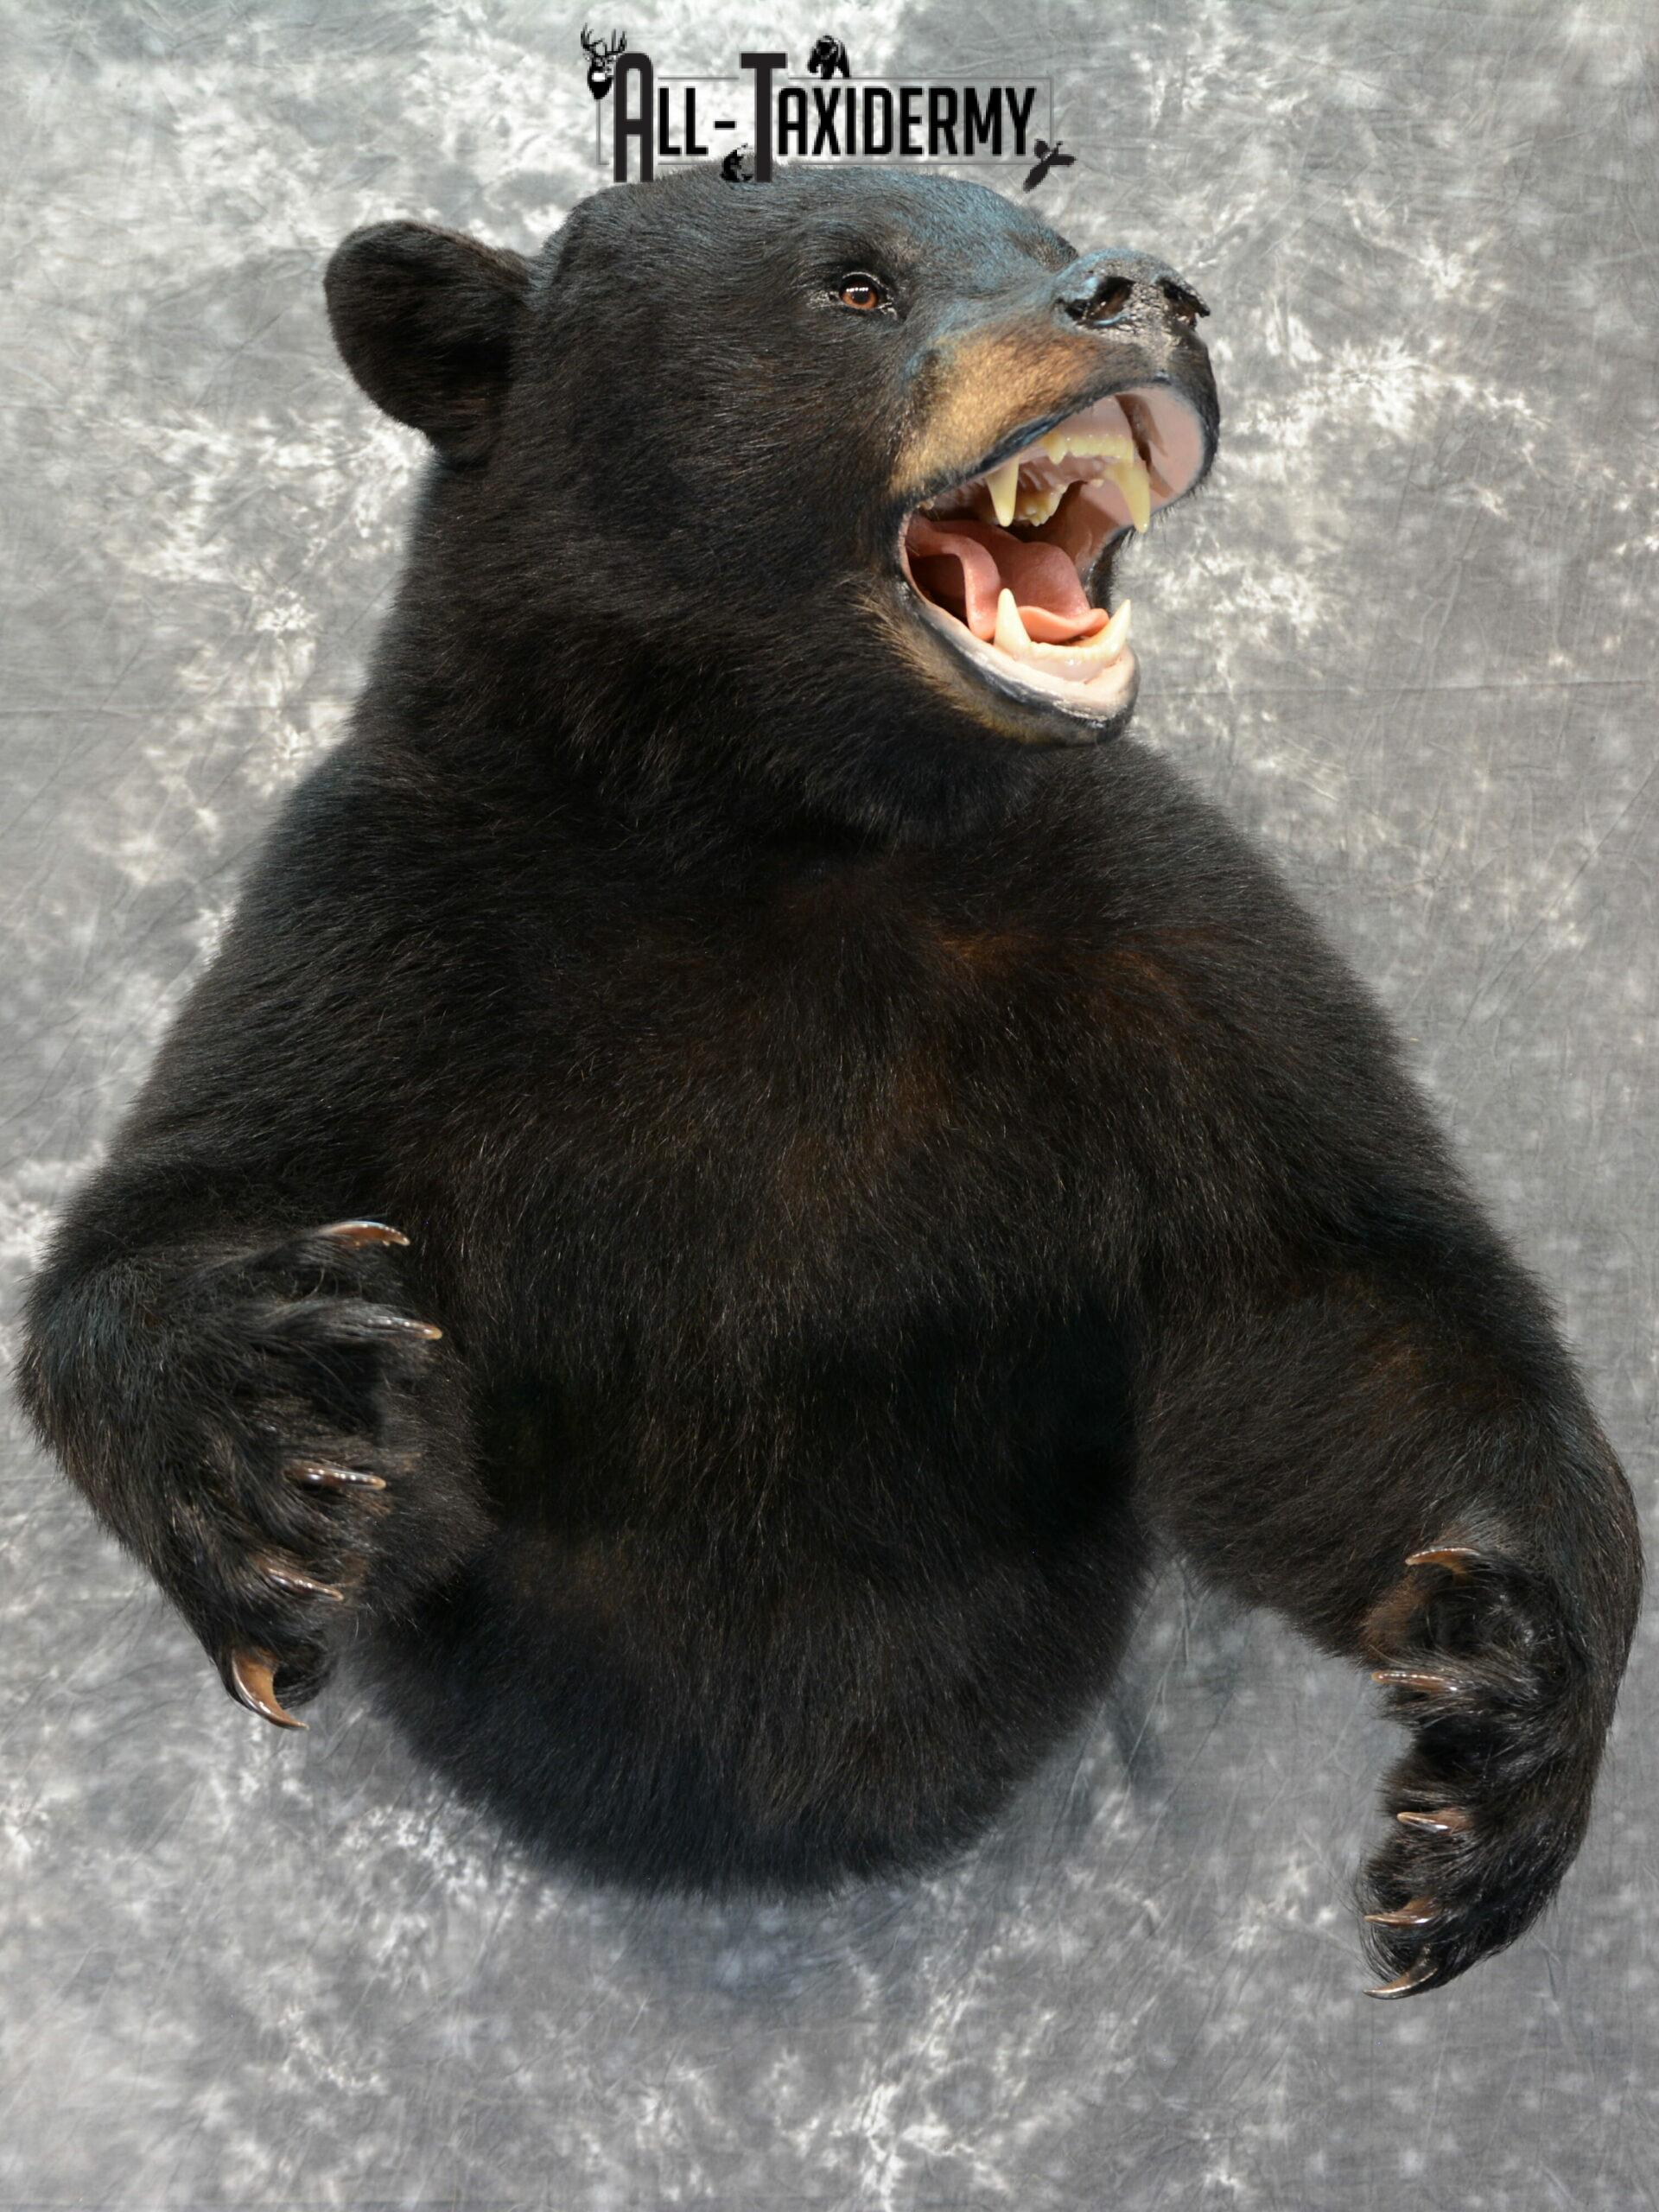 Black Bear Taxidermy mount for Sale SKU 1044